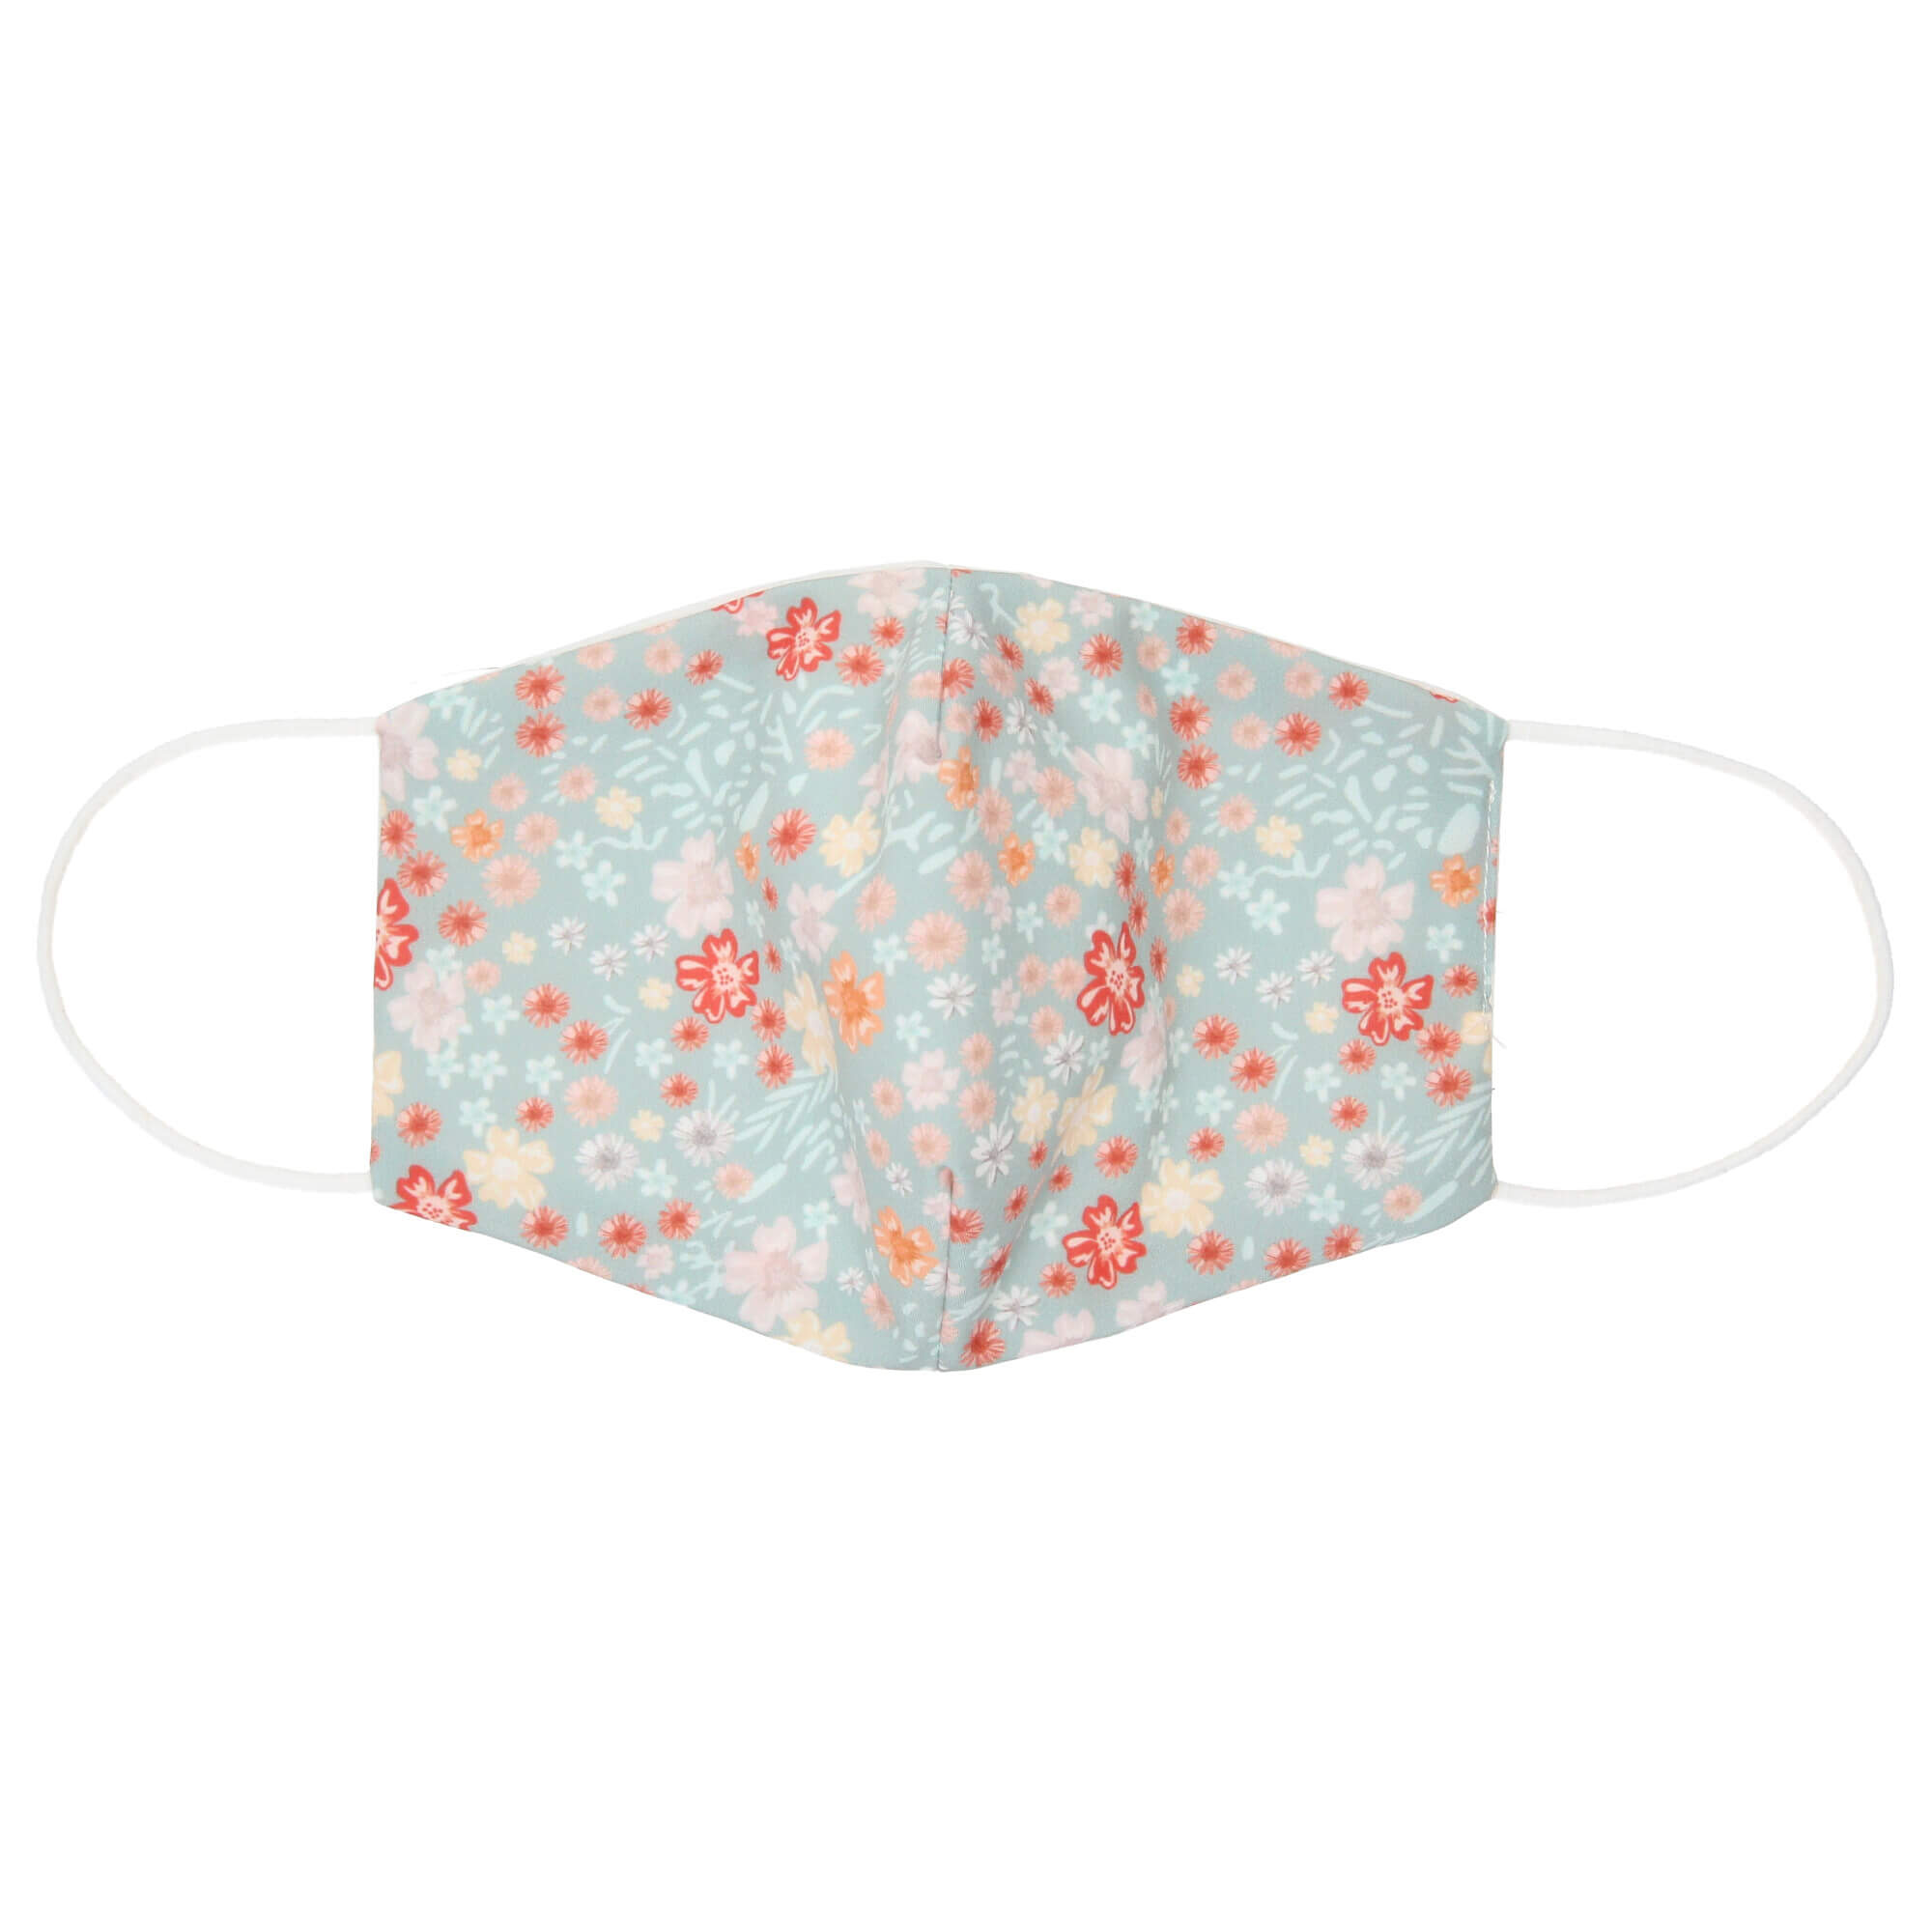 Wasbare Katoenen Mondkapje Bloemen Print